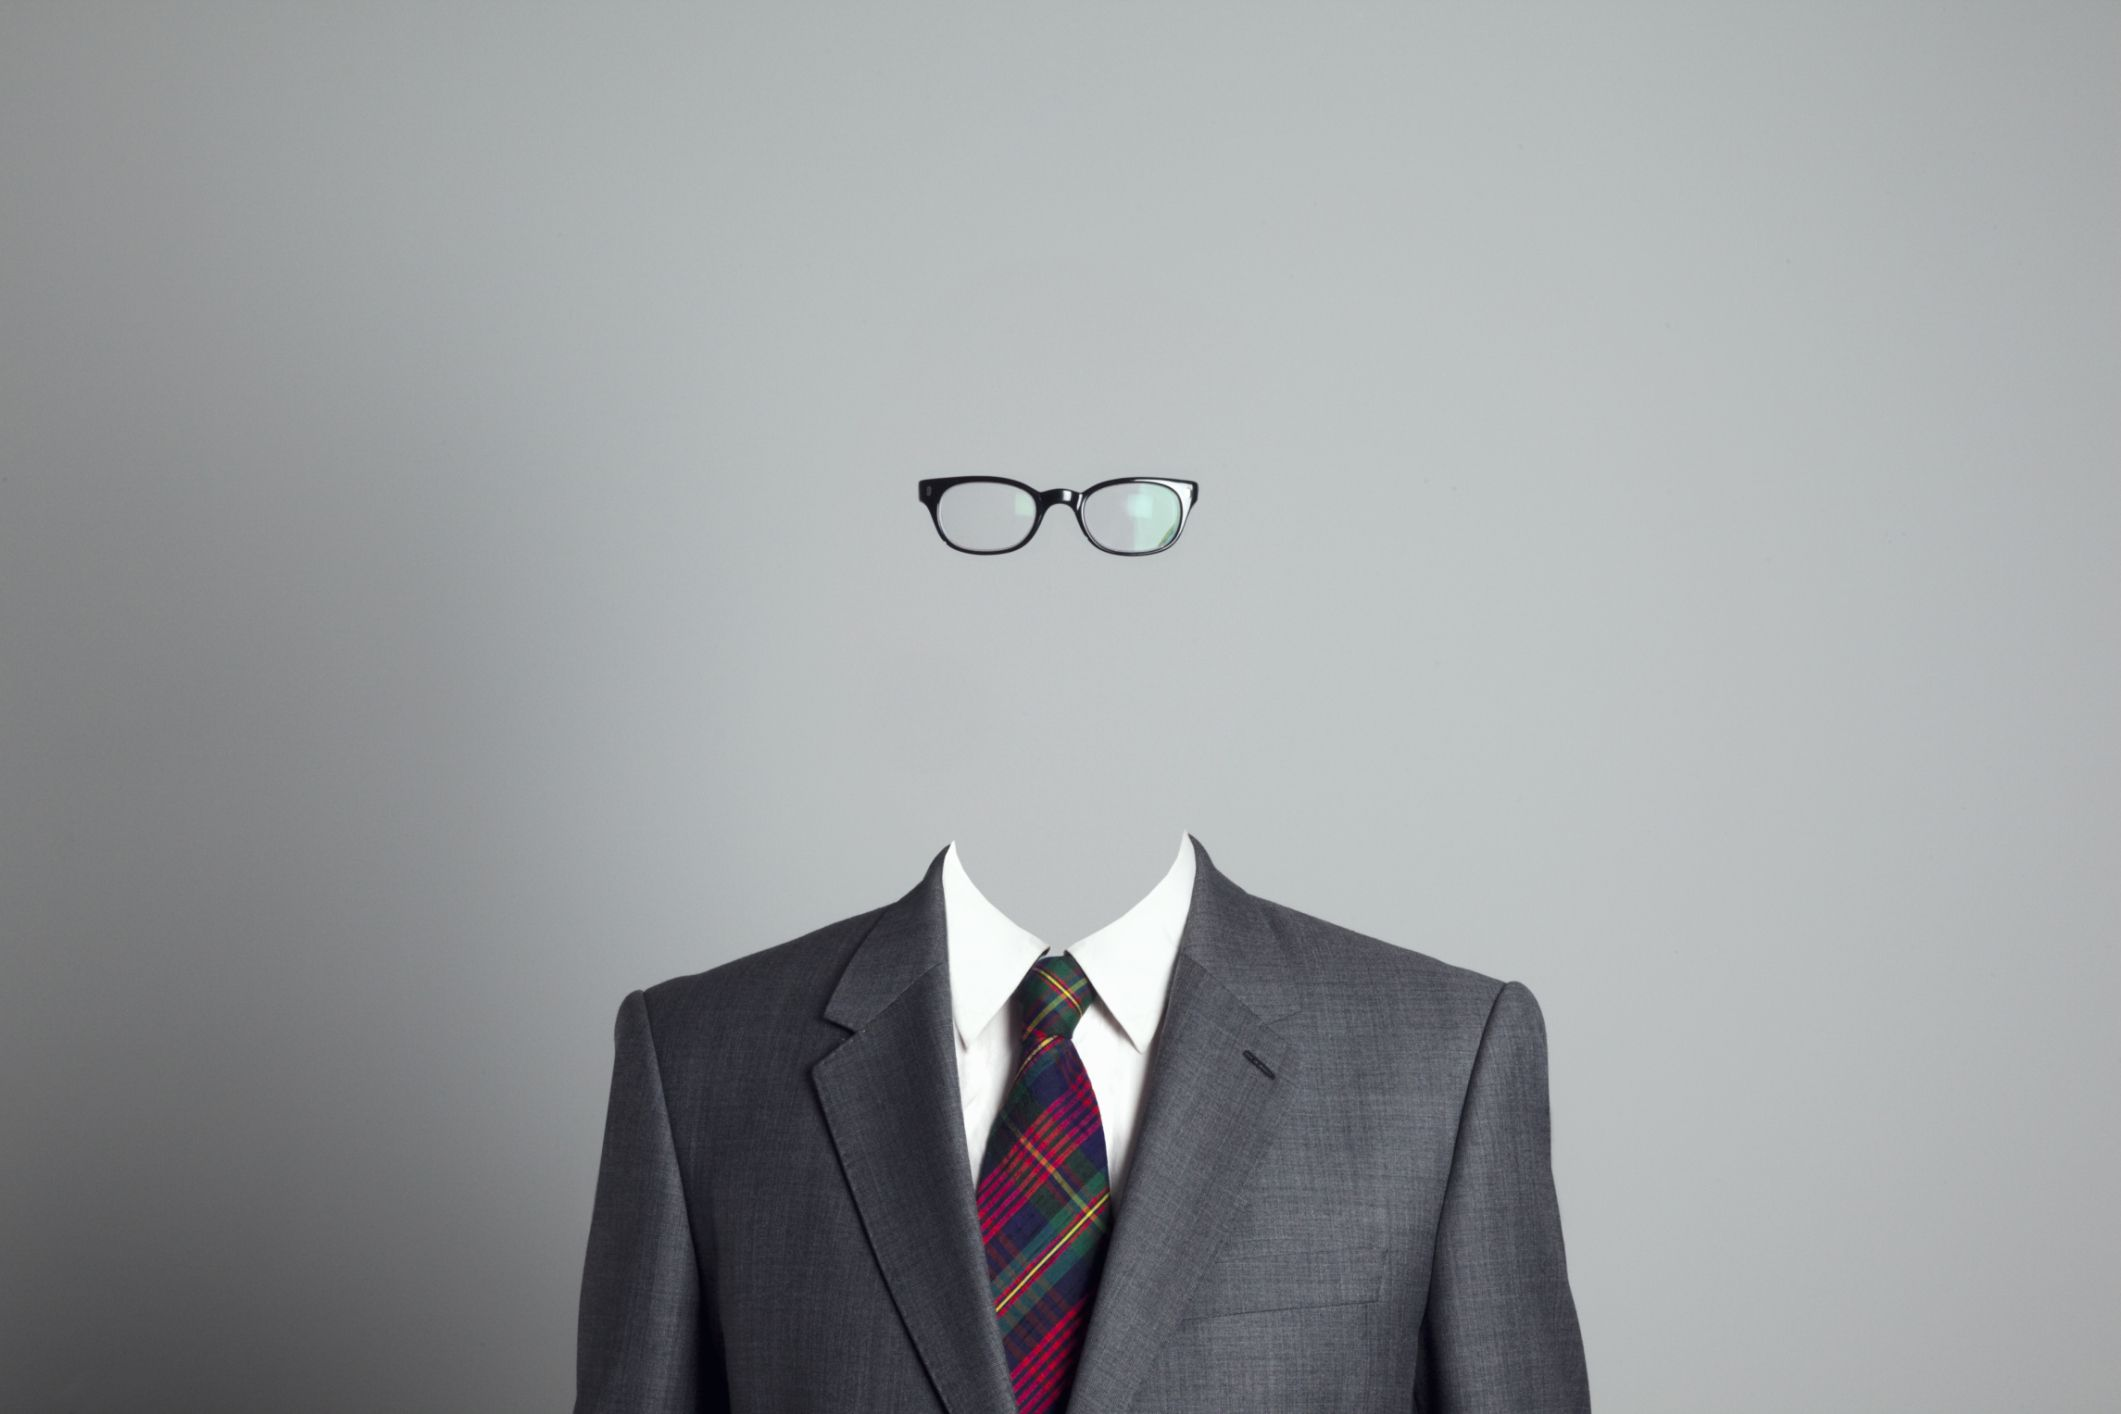 Hombre-invisible-hires.jpg